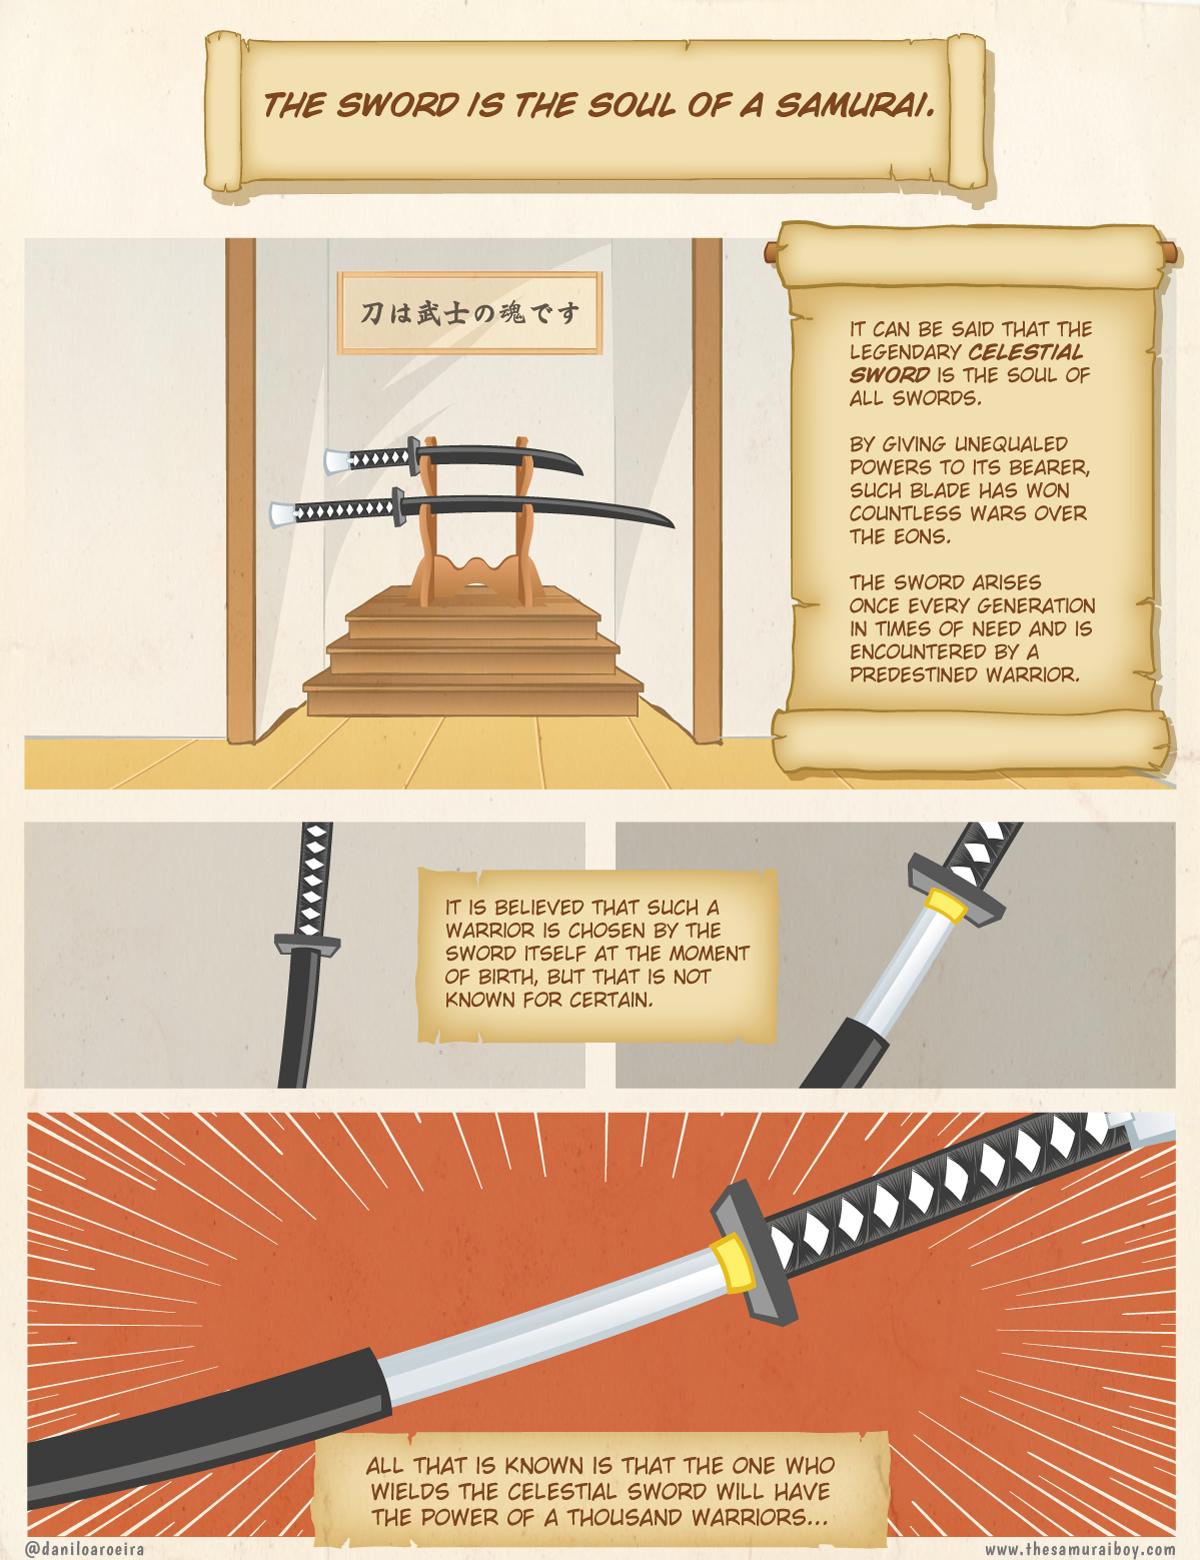 The soul of a samurai